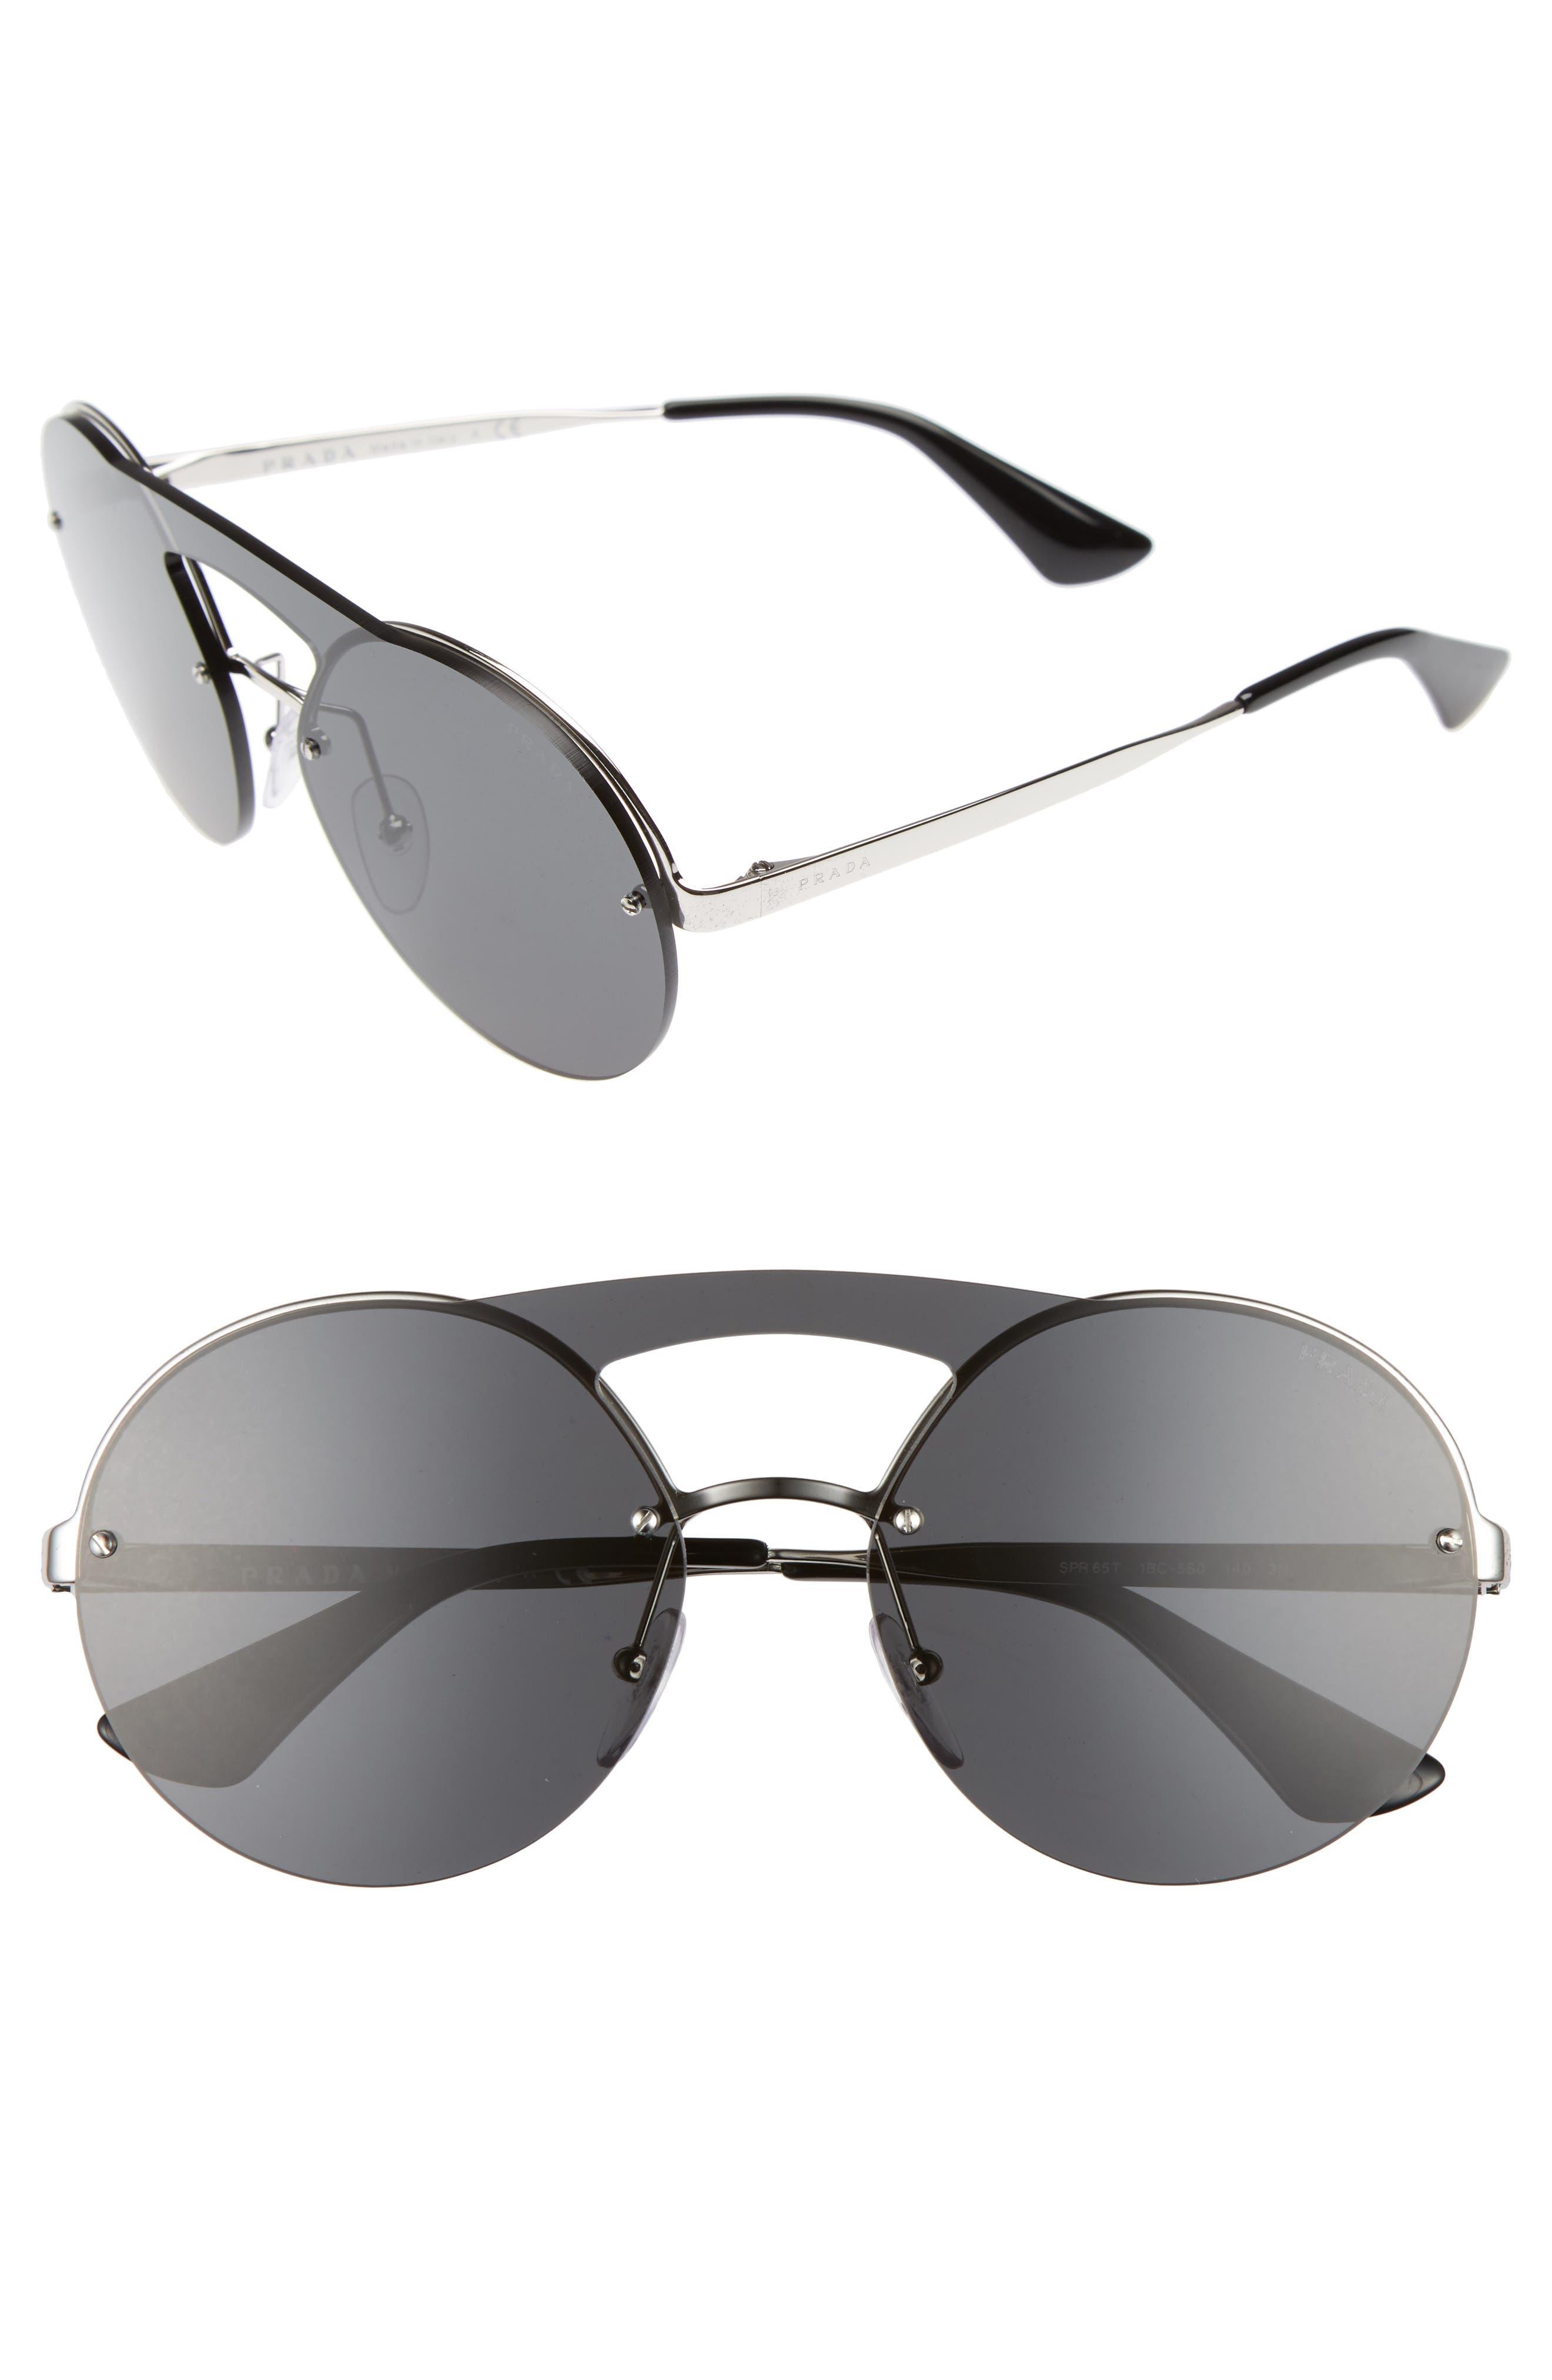 60mm Round Rimless Sunglasses,                         Main,                         color, Grey Gradient